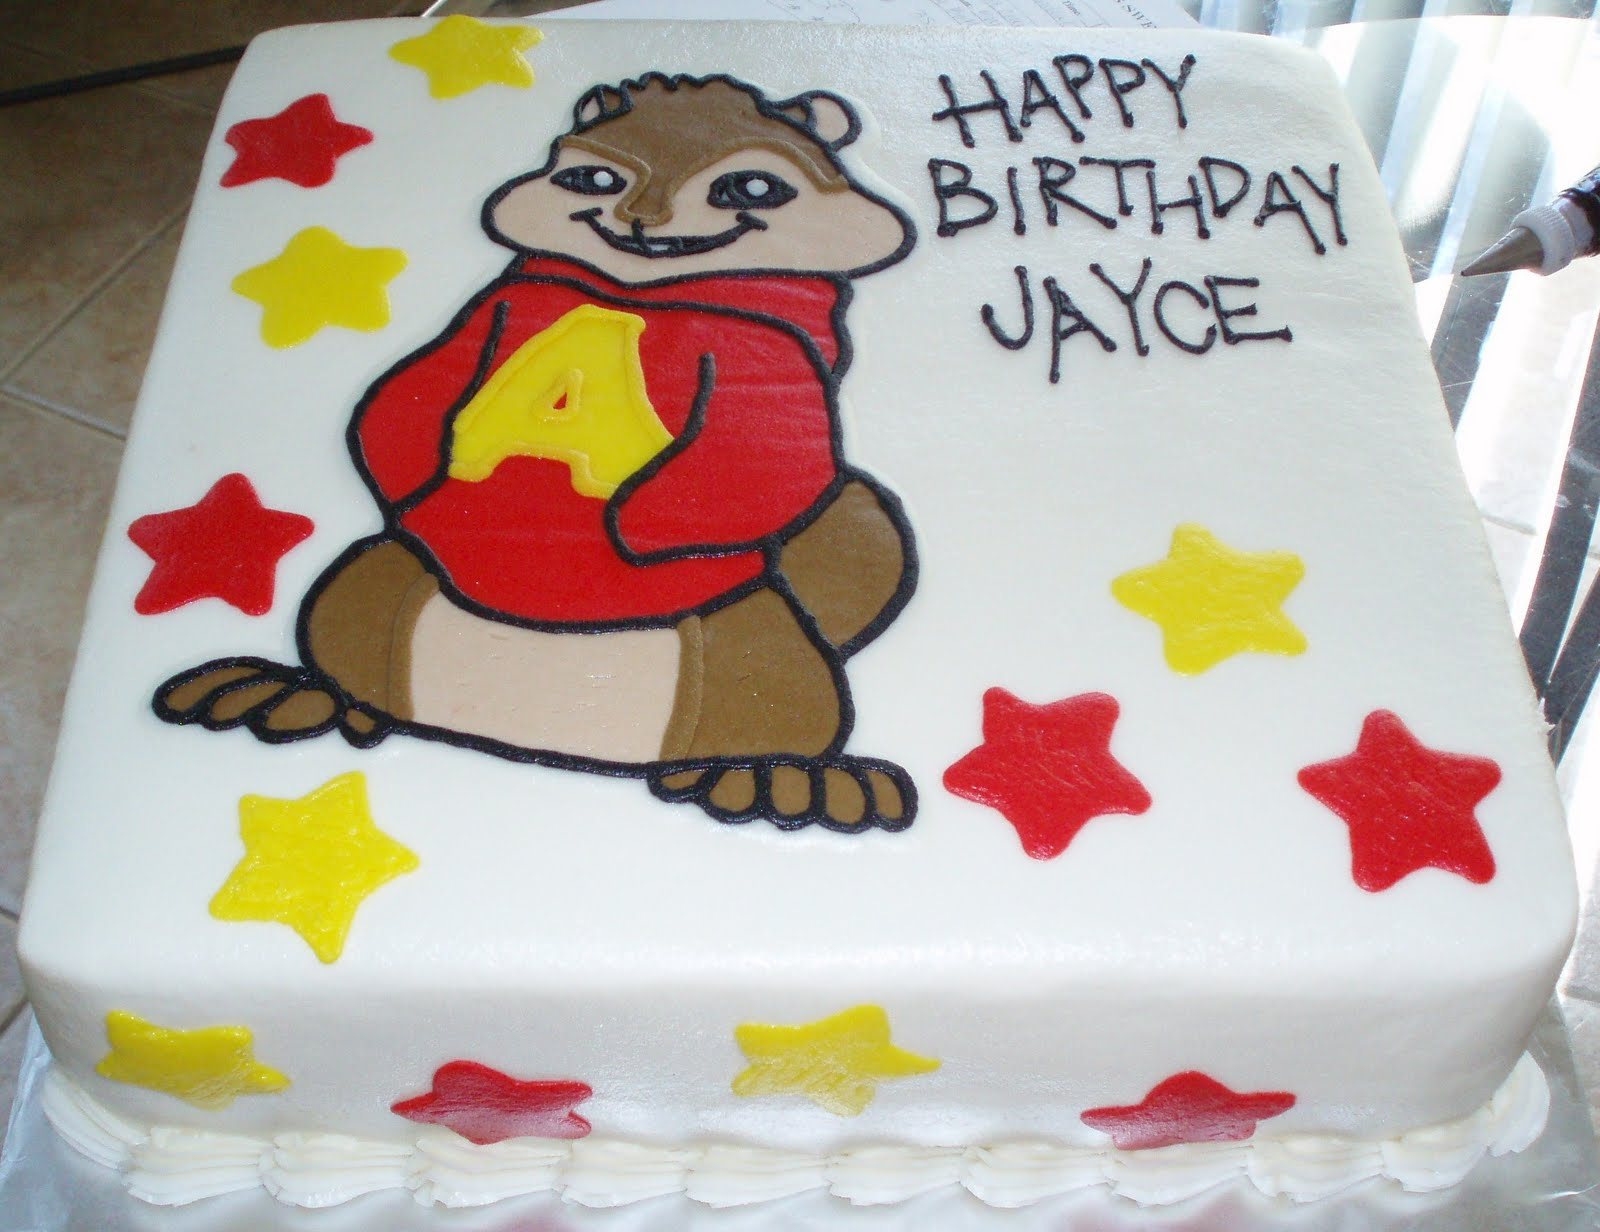 Alvin And The Chipmunks Birthday Cake: SAMANTHA'S SWEET TREATS